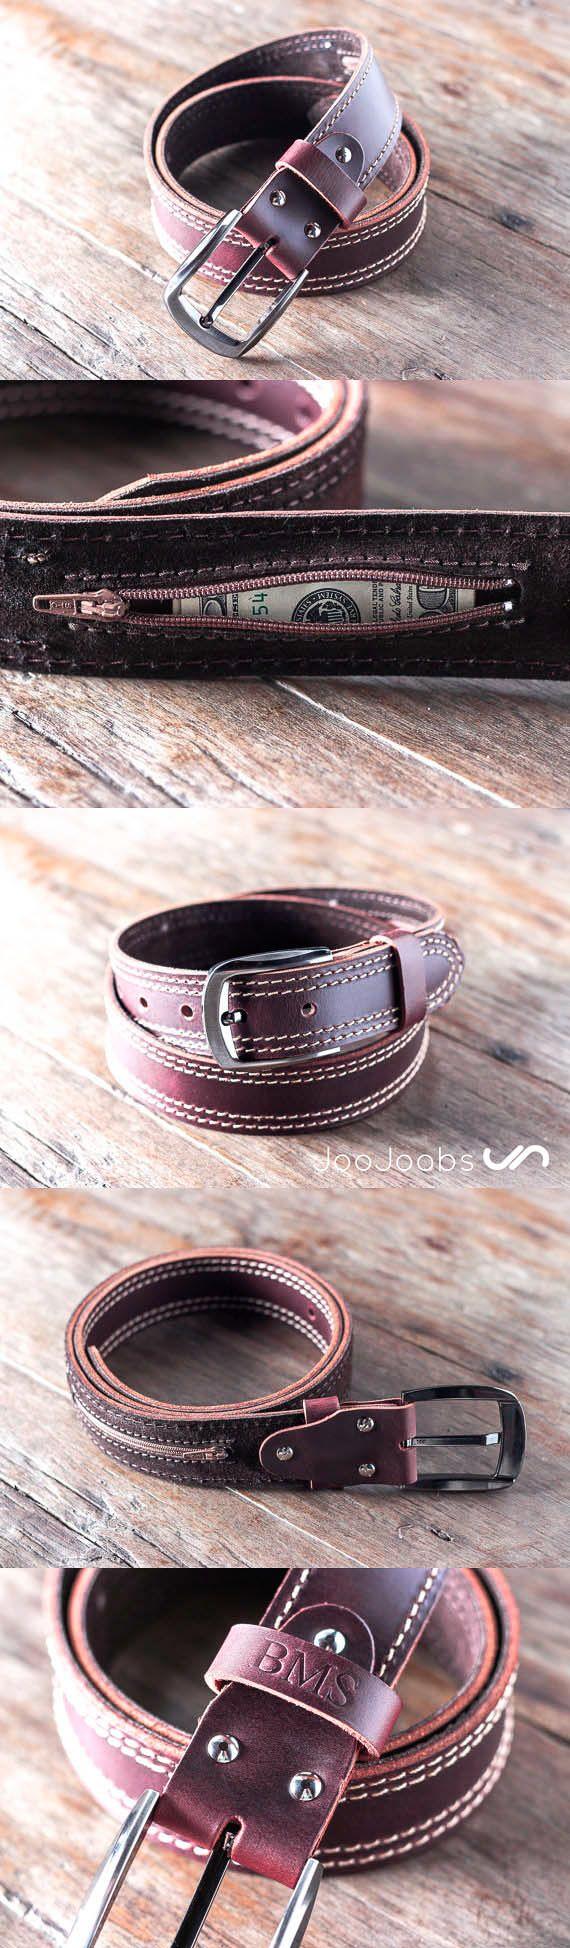 Handmade Mens Leather Belt by JooJoobs.com This belt has a secret, hidden pocket sewn into the inside lining. The belt is handmade and will last a lifetime. #JooJoobs #handmade #belt